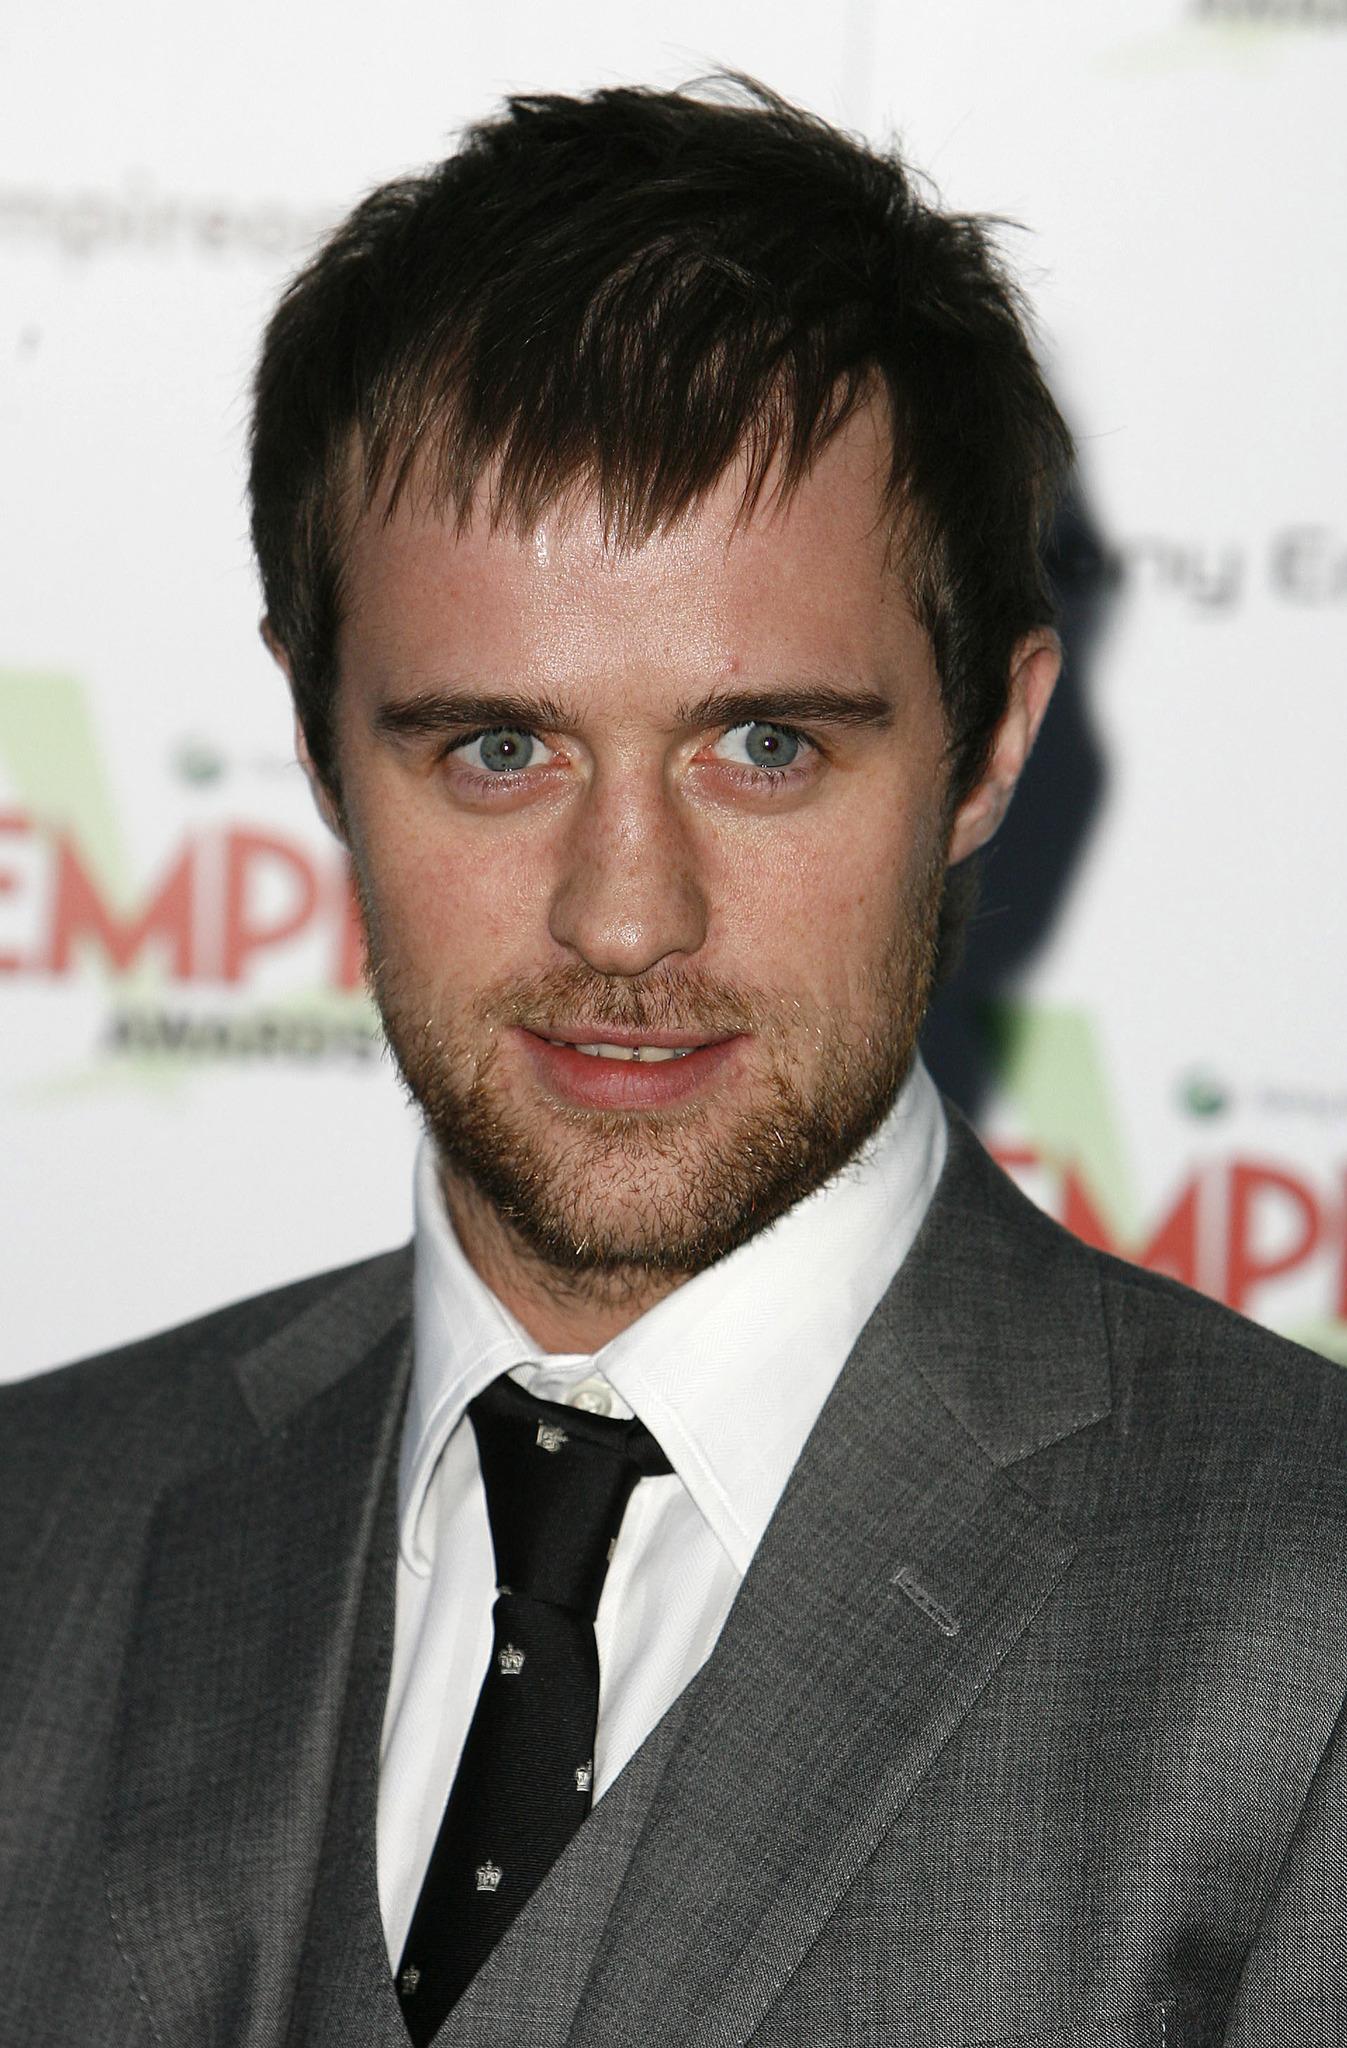 Jonas Armstrong (born 1981 (born in Dublin, Ireland)